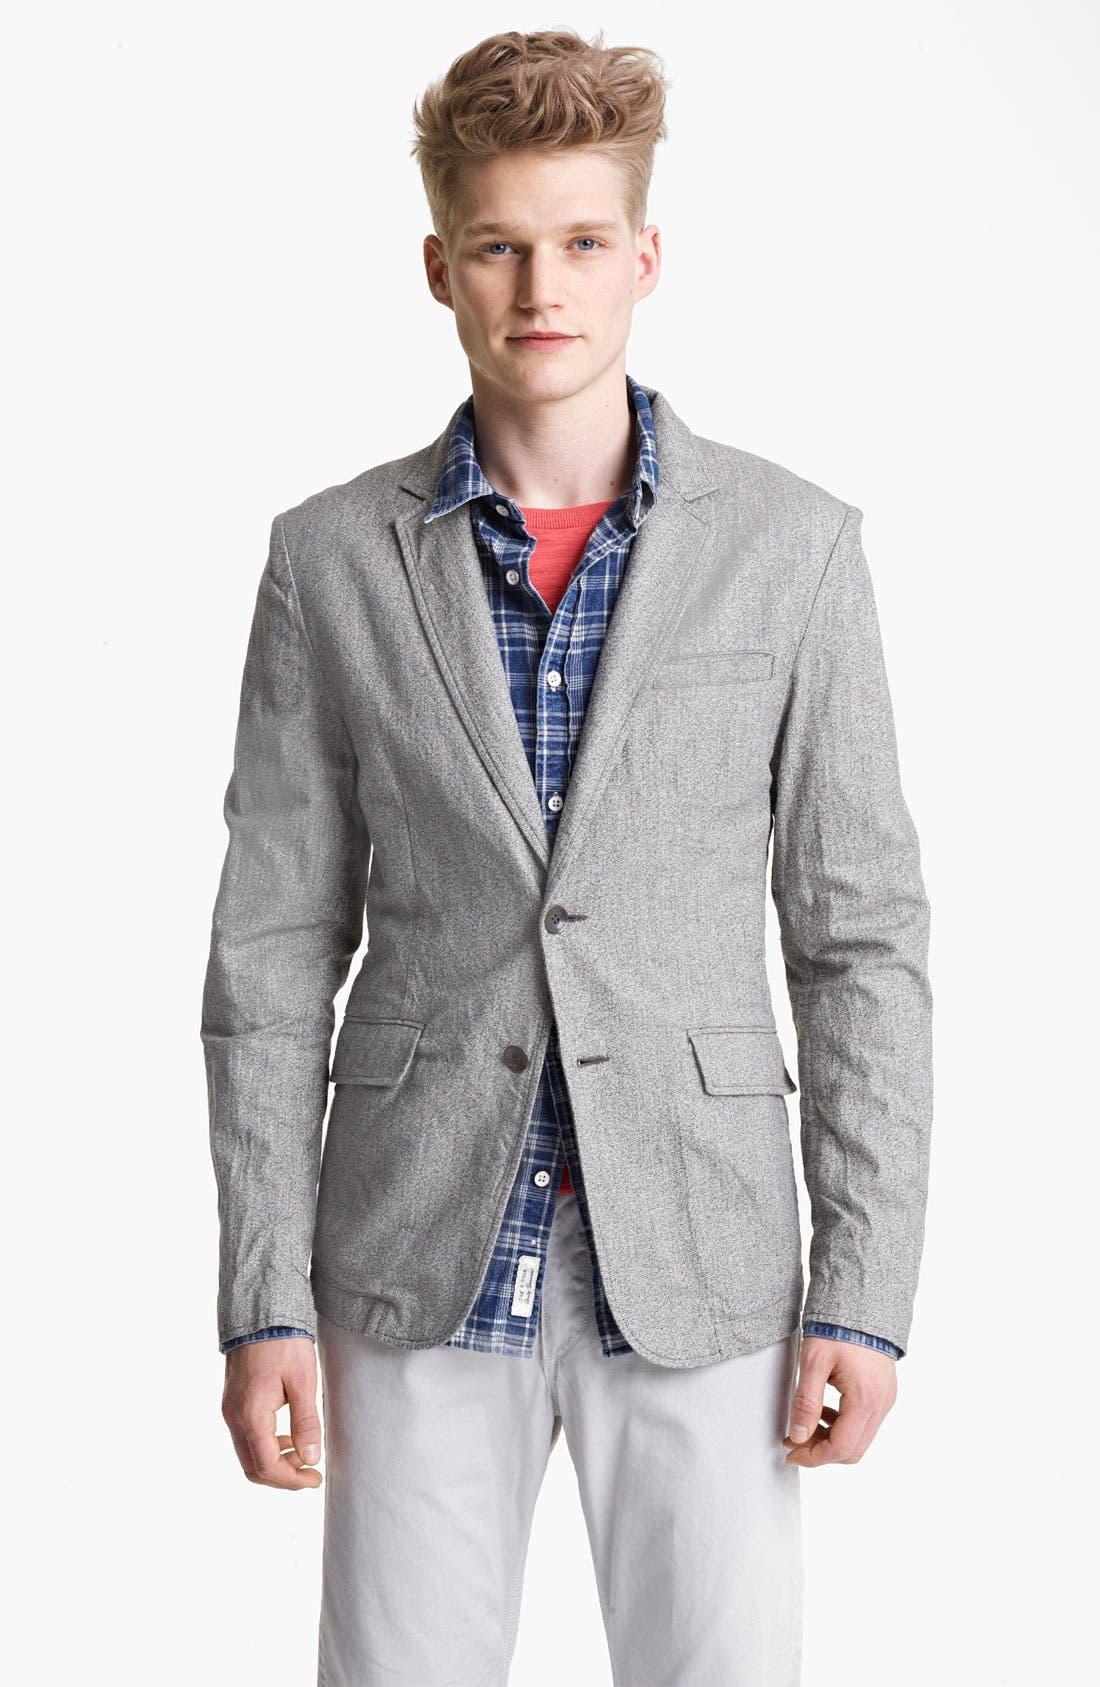 Alternate Image 1 Selected - rag & bone 'Phillips' Cotton & Linen Sportcoat